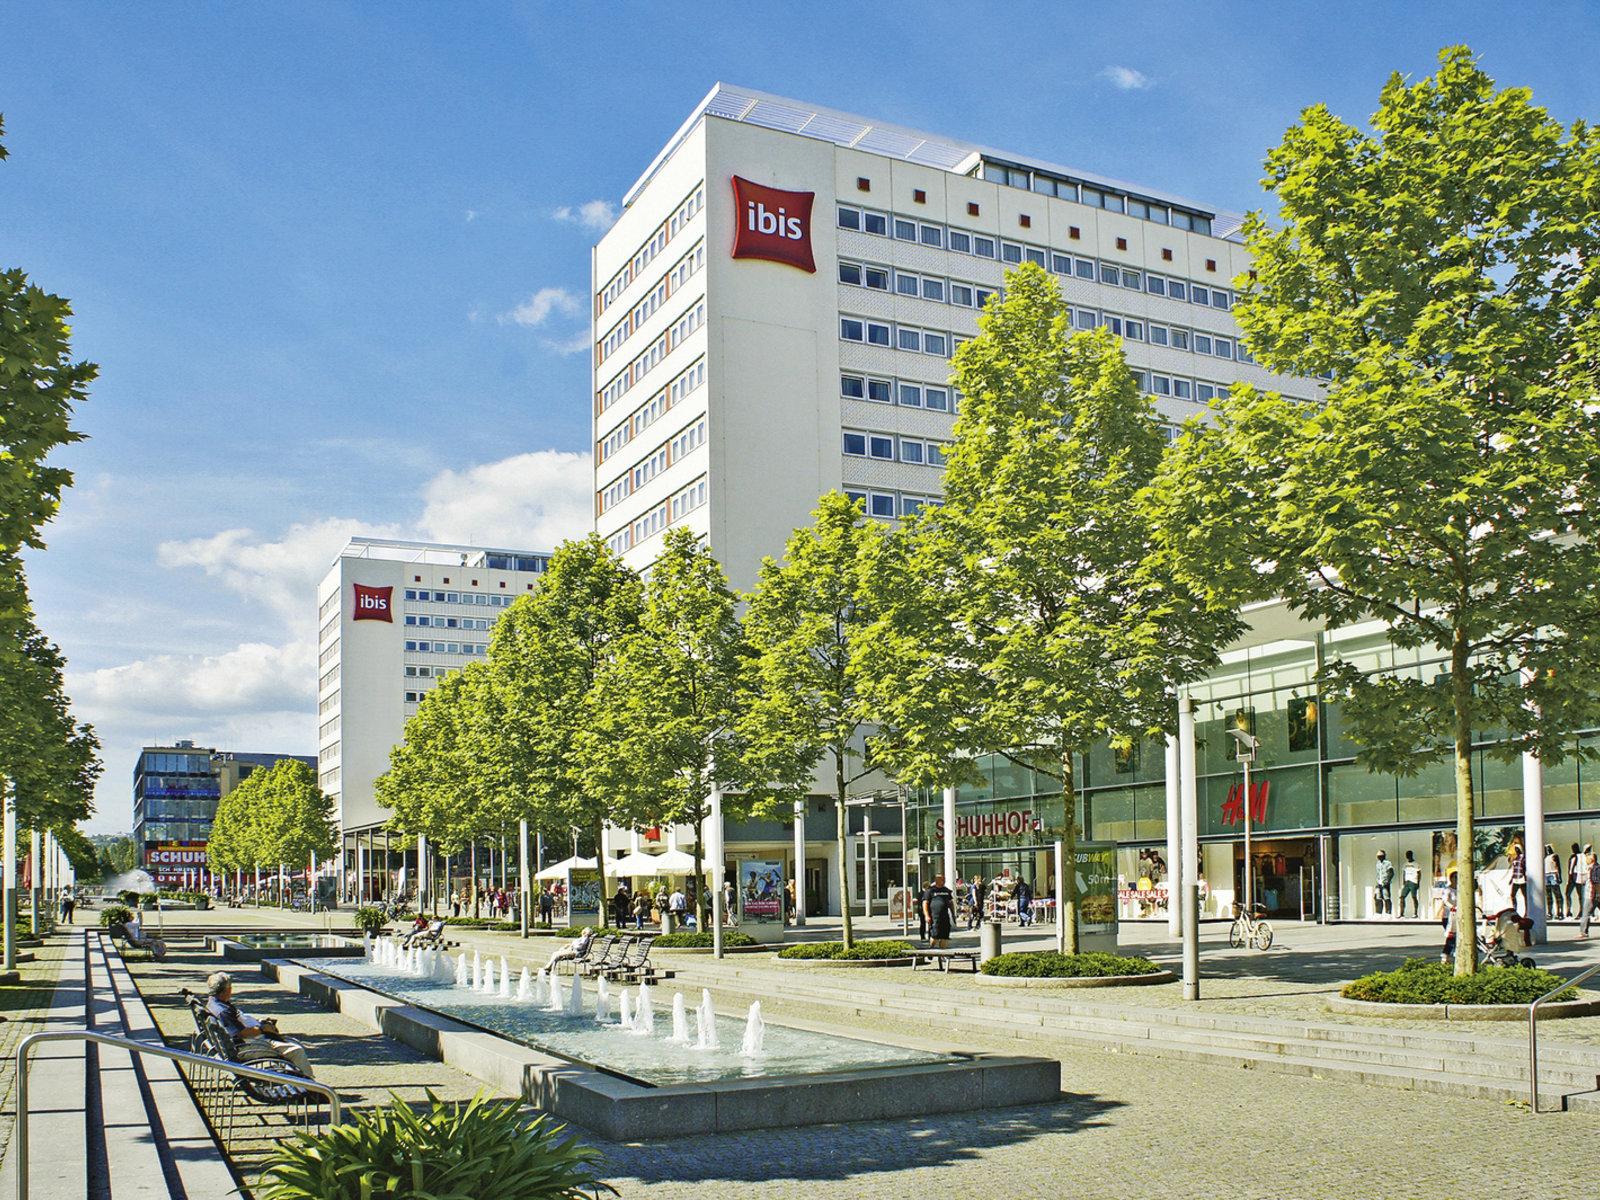 Ibis dresden zentrum last minute urlaub in den sch nsten for Dresden hotel zentrum